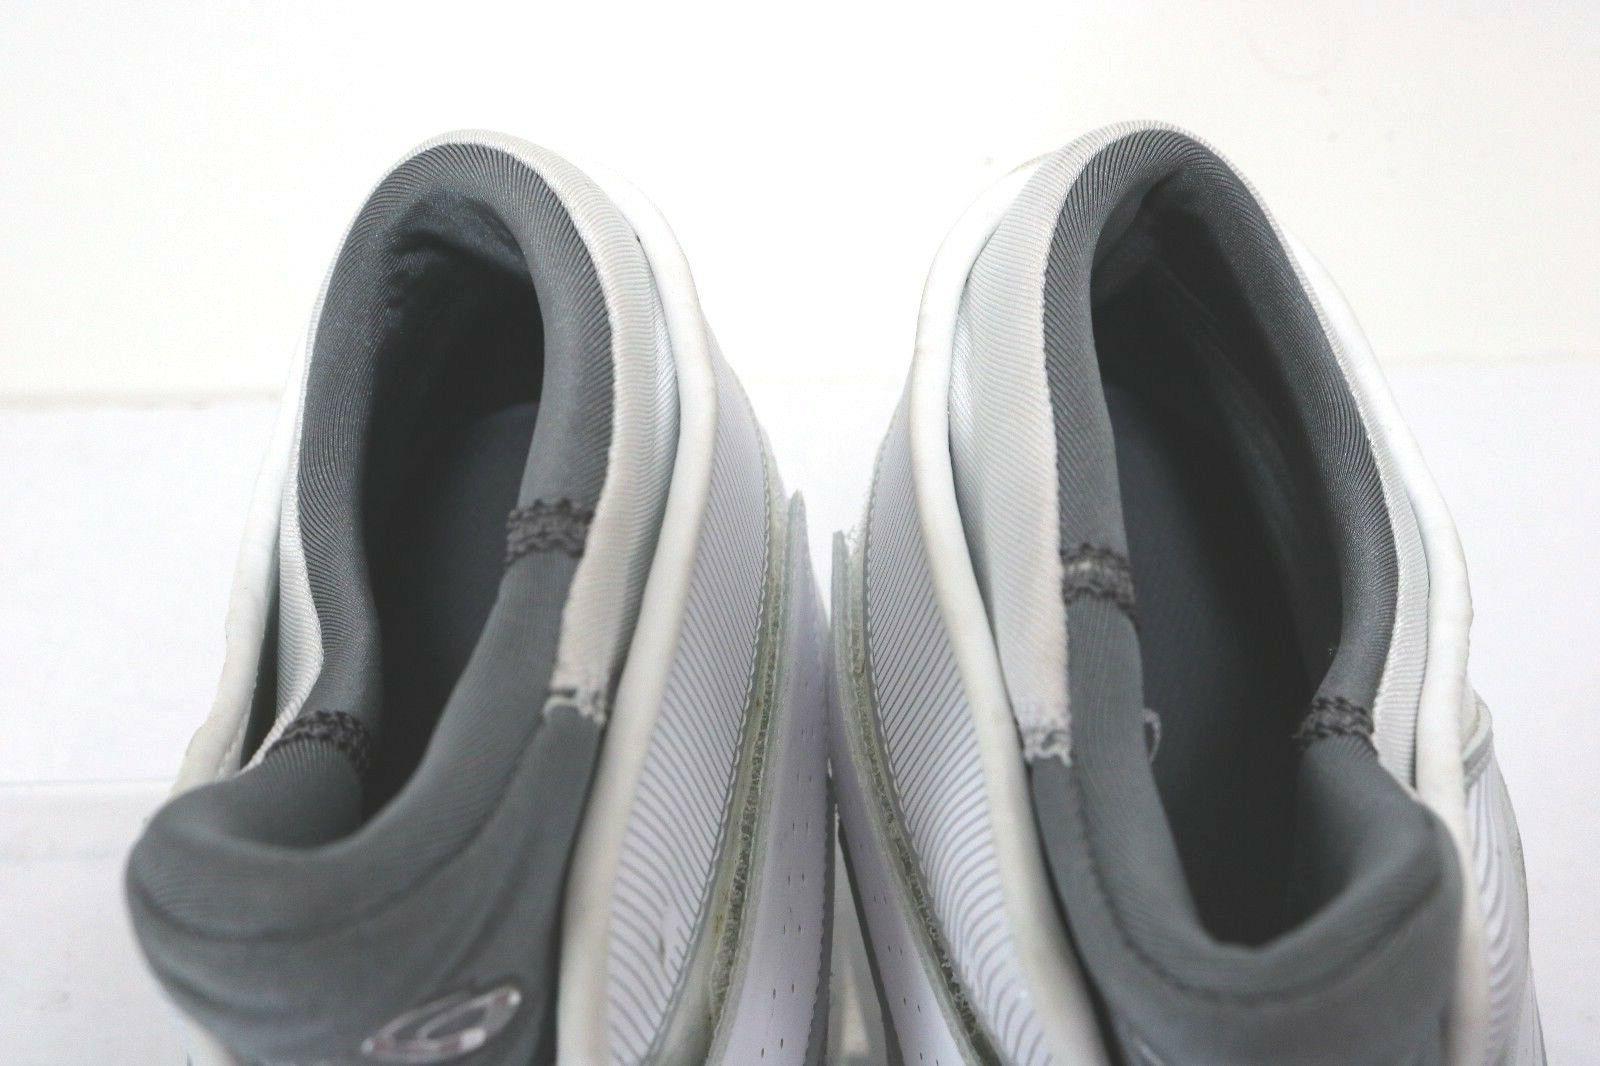 Asics Naked $120 Hi-Top Basketball Shoes Leather White